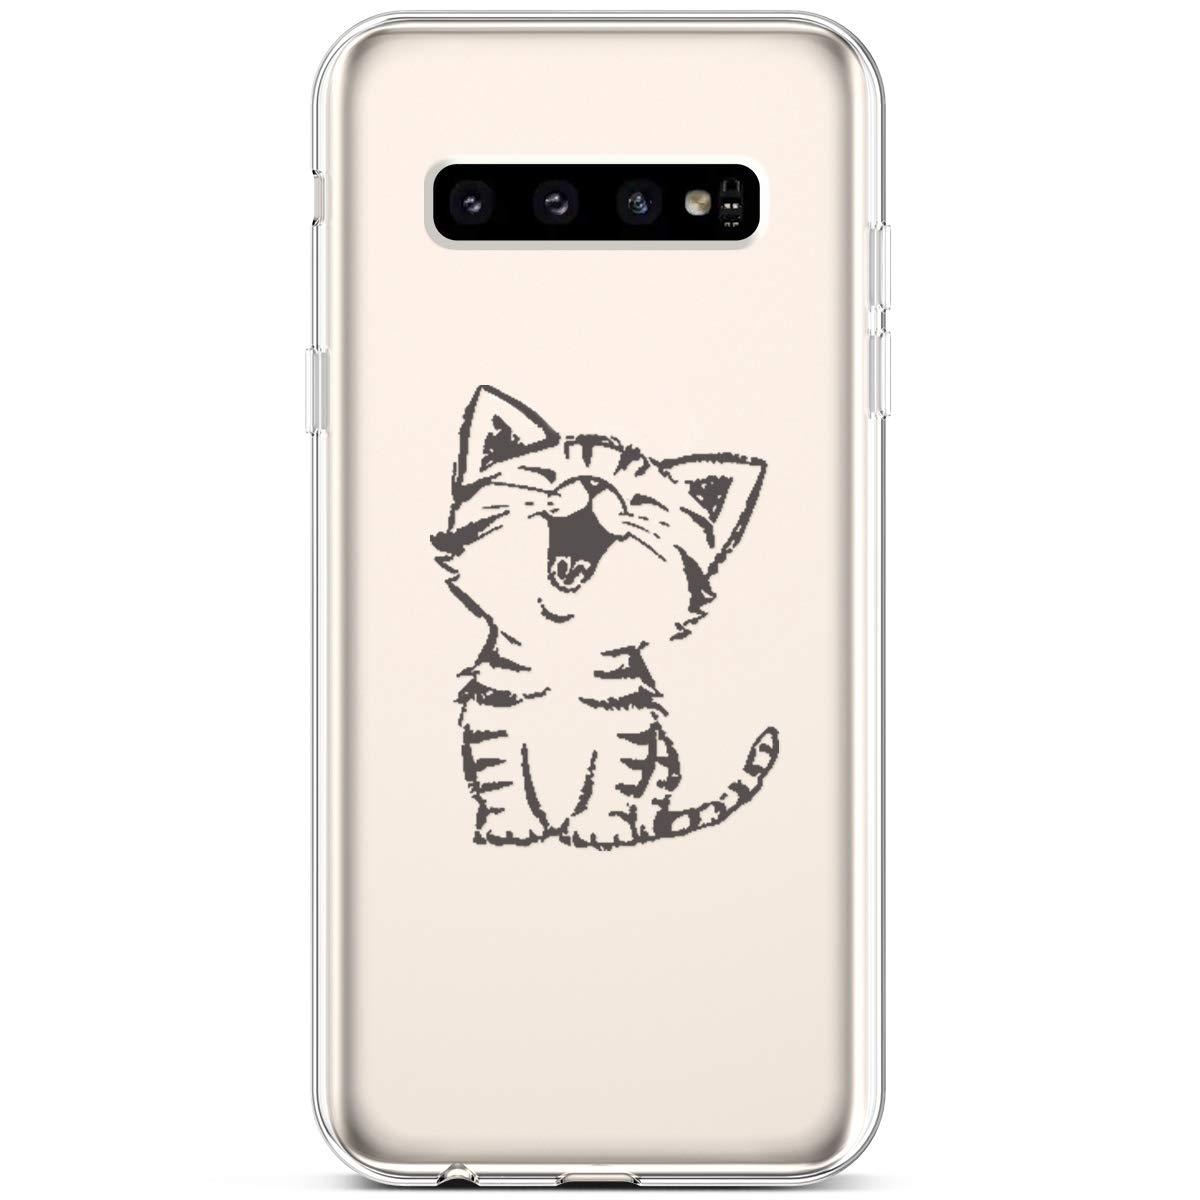 Hpory Housse Compatible avec Samsung Galaxy S10 Coque Silicone Flexible Transparent Ultra Fine TPU Silicone Bumper Case Antichoc Étui Crystal Clear Mince Soft Cover,Dinosaure Vert